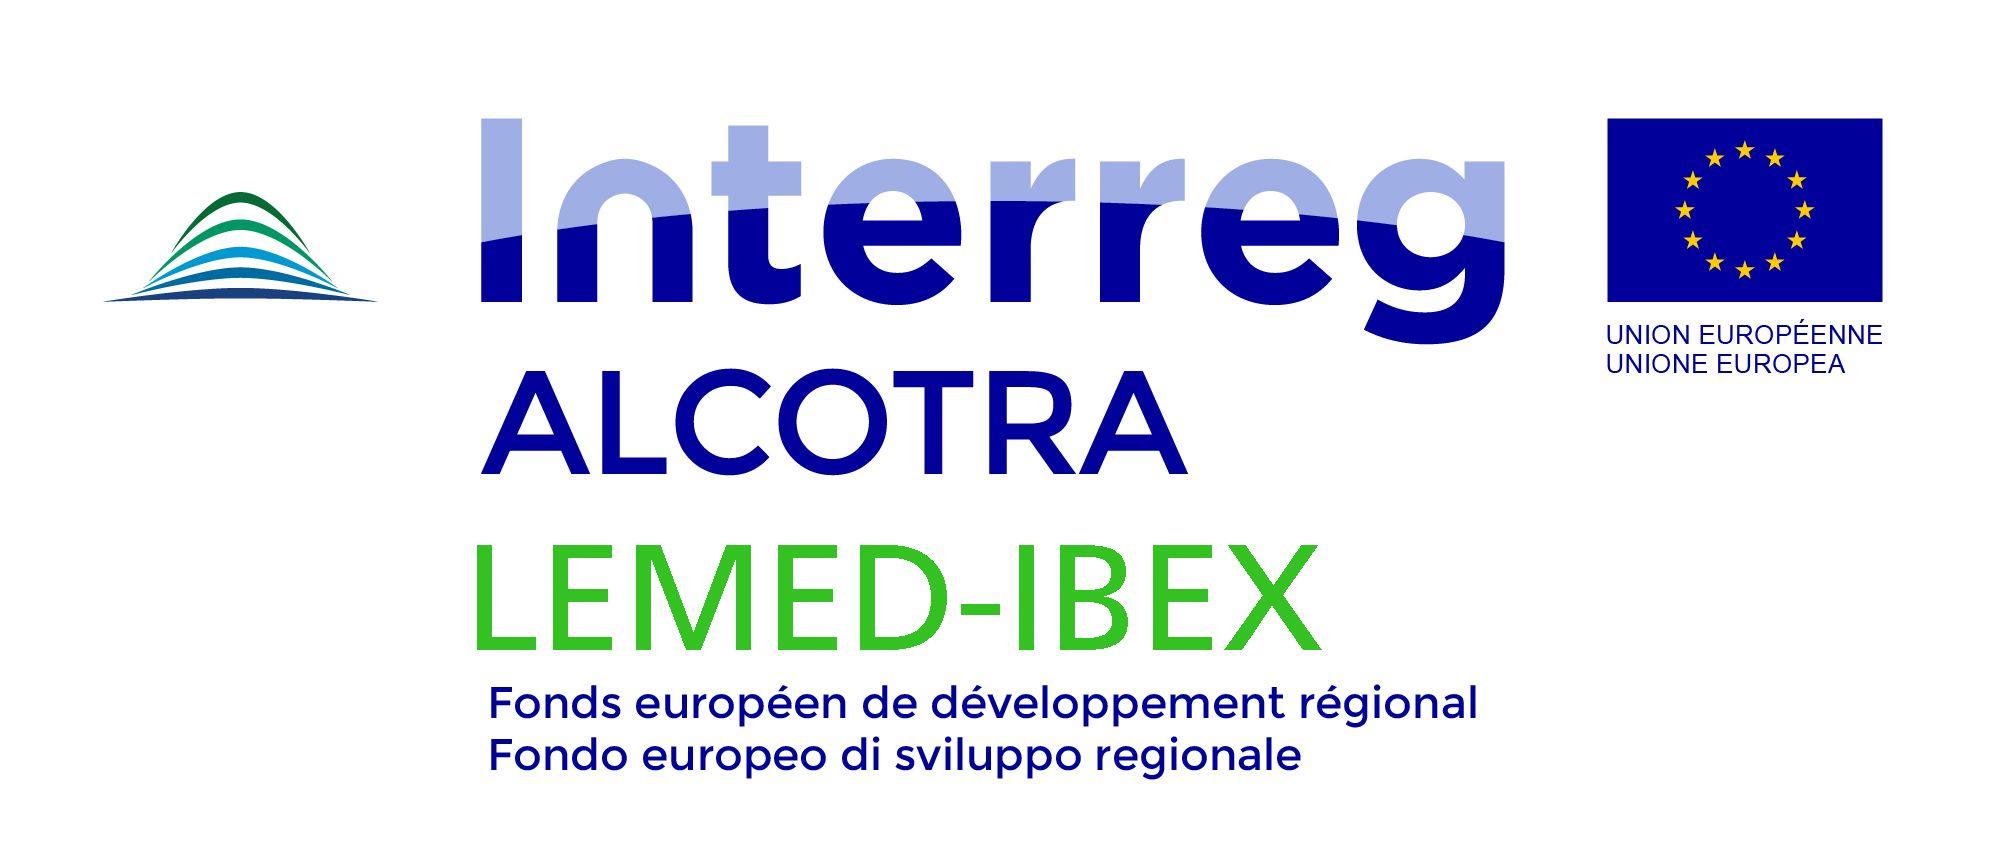 Programme Interreg ALCOTRA Lemed_Ibex